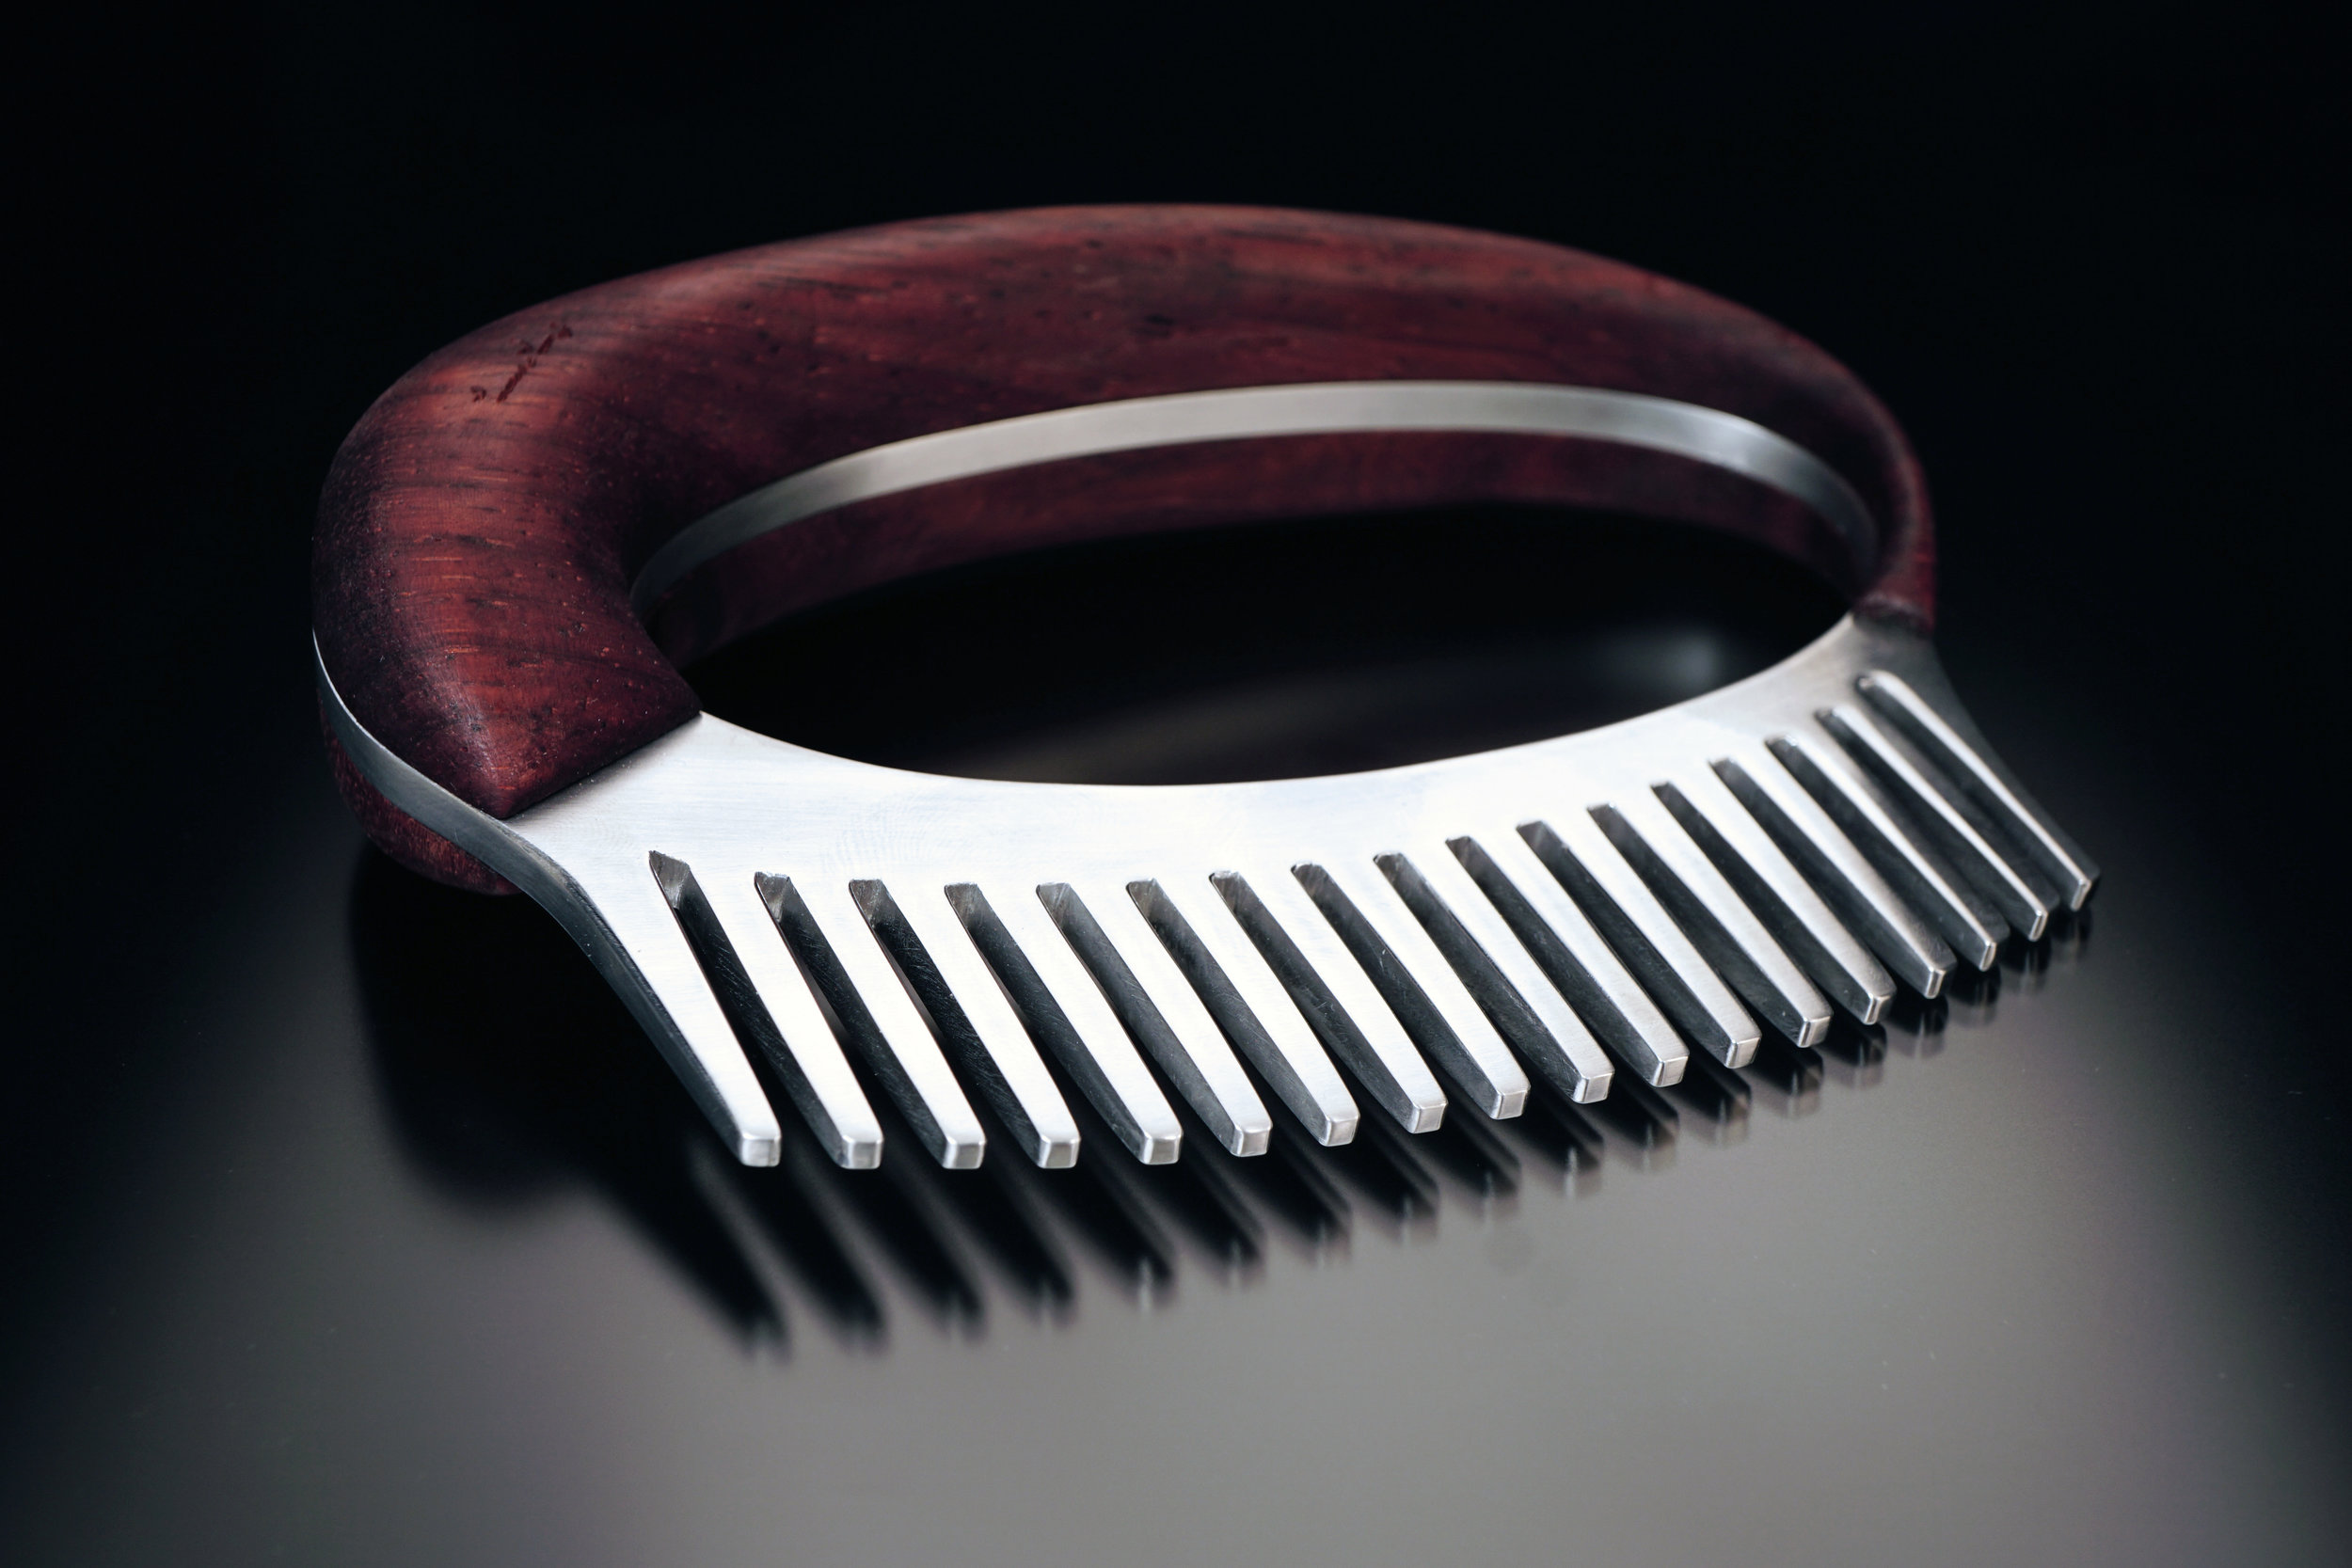 Recurrent Comb